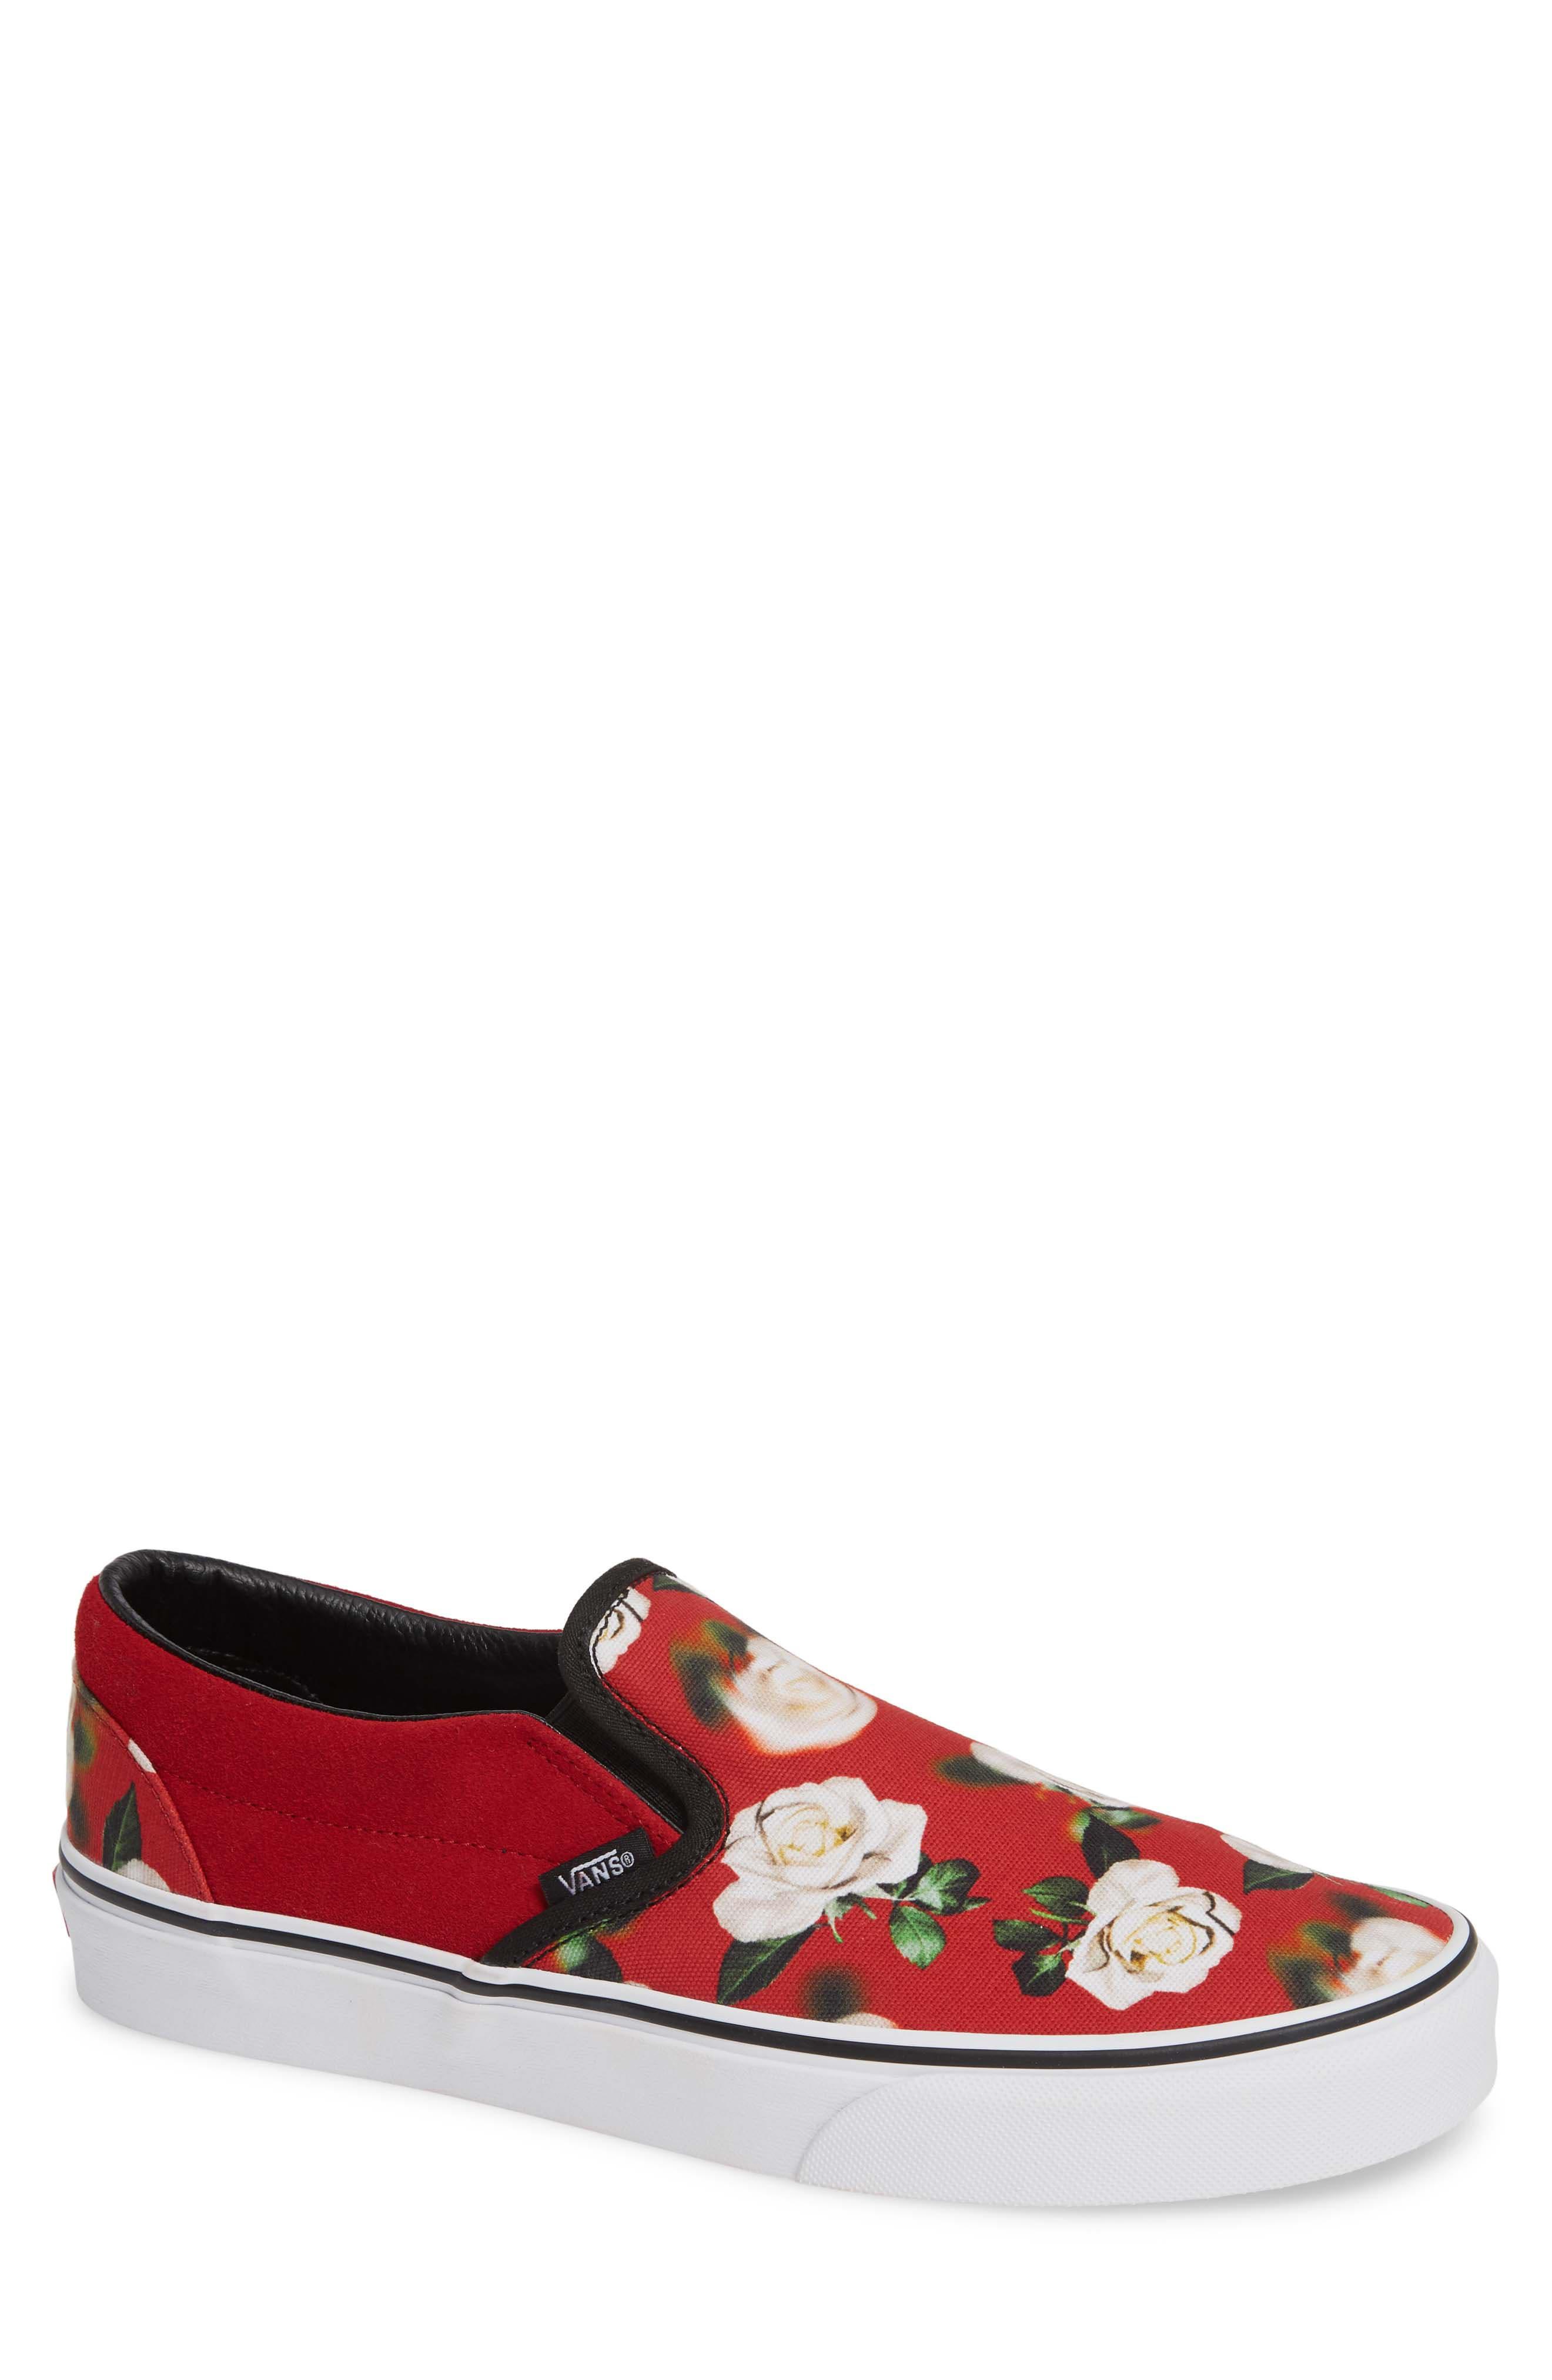 'Classic' Slip-On Sneaker,                             Main thumbnail 1, color,                             CHILI PEPPER/ ROMANTIC FLORAL